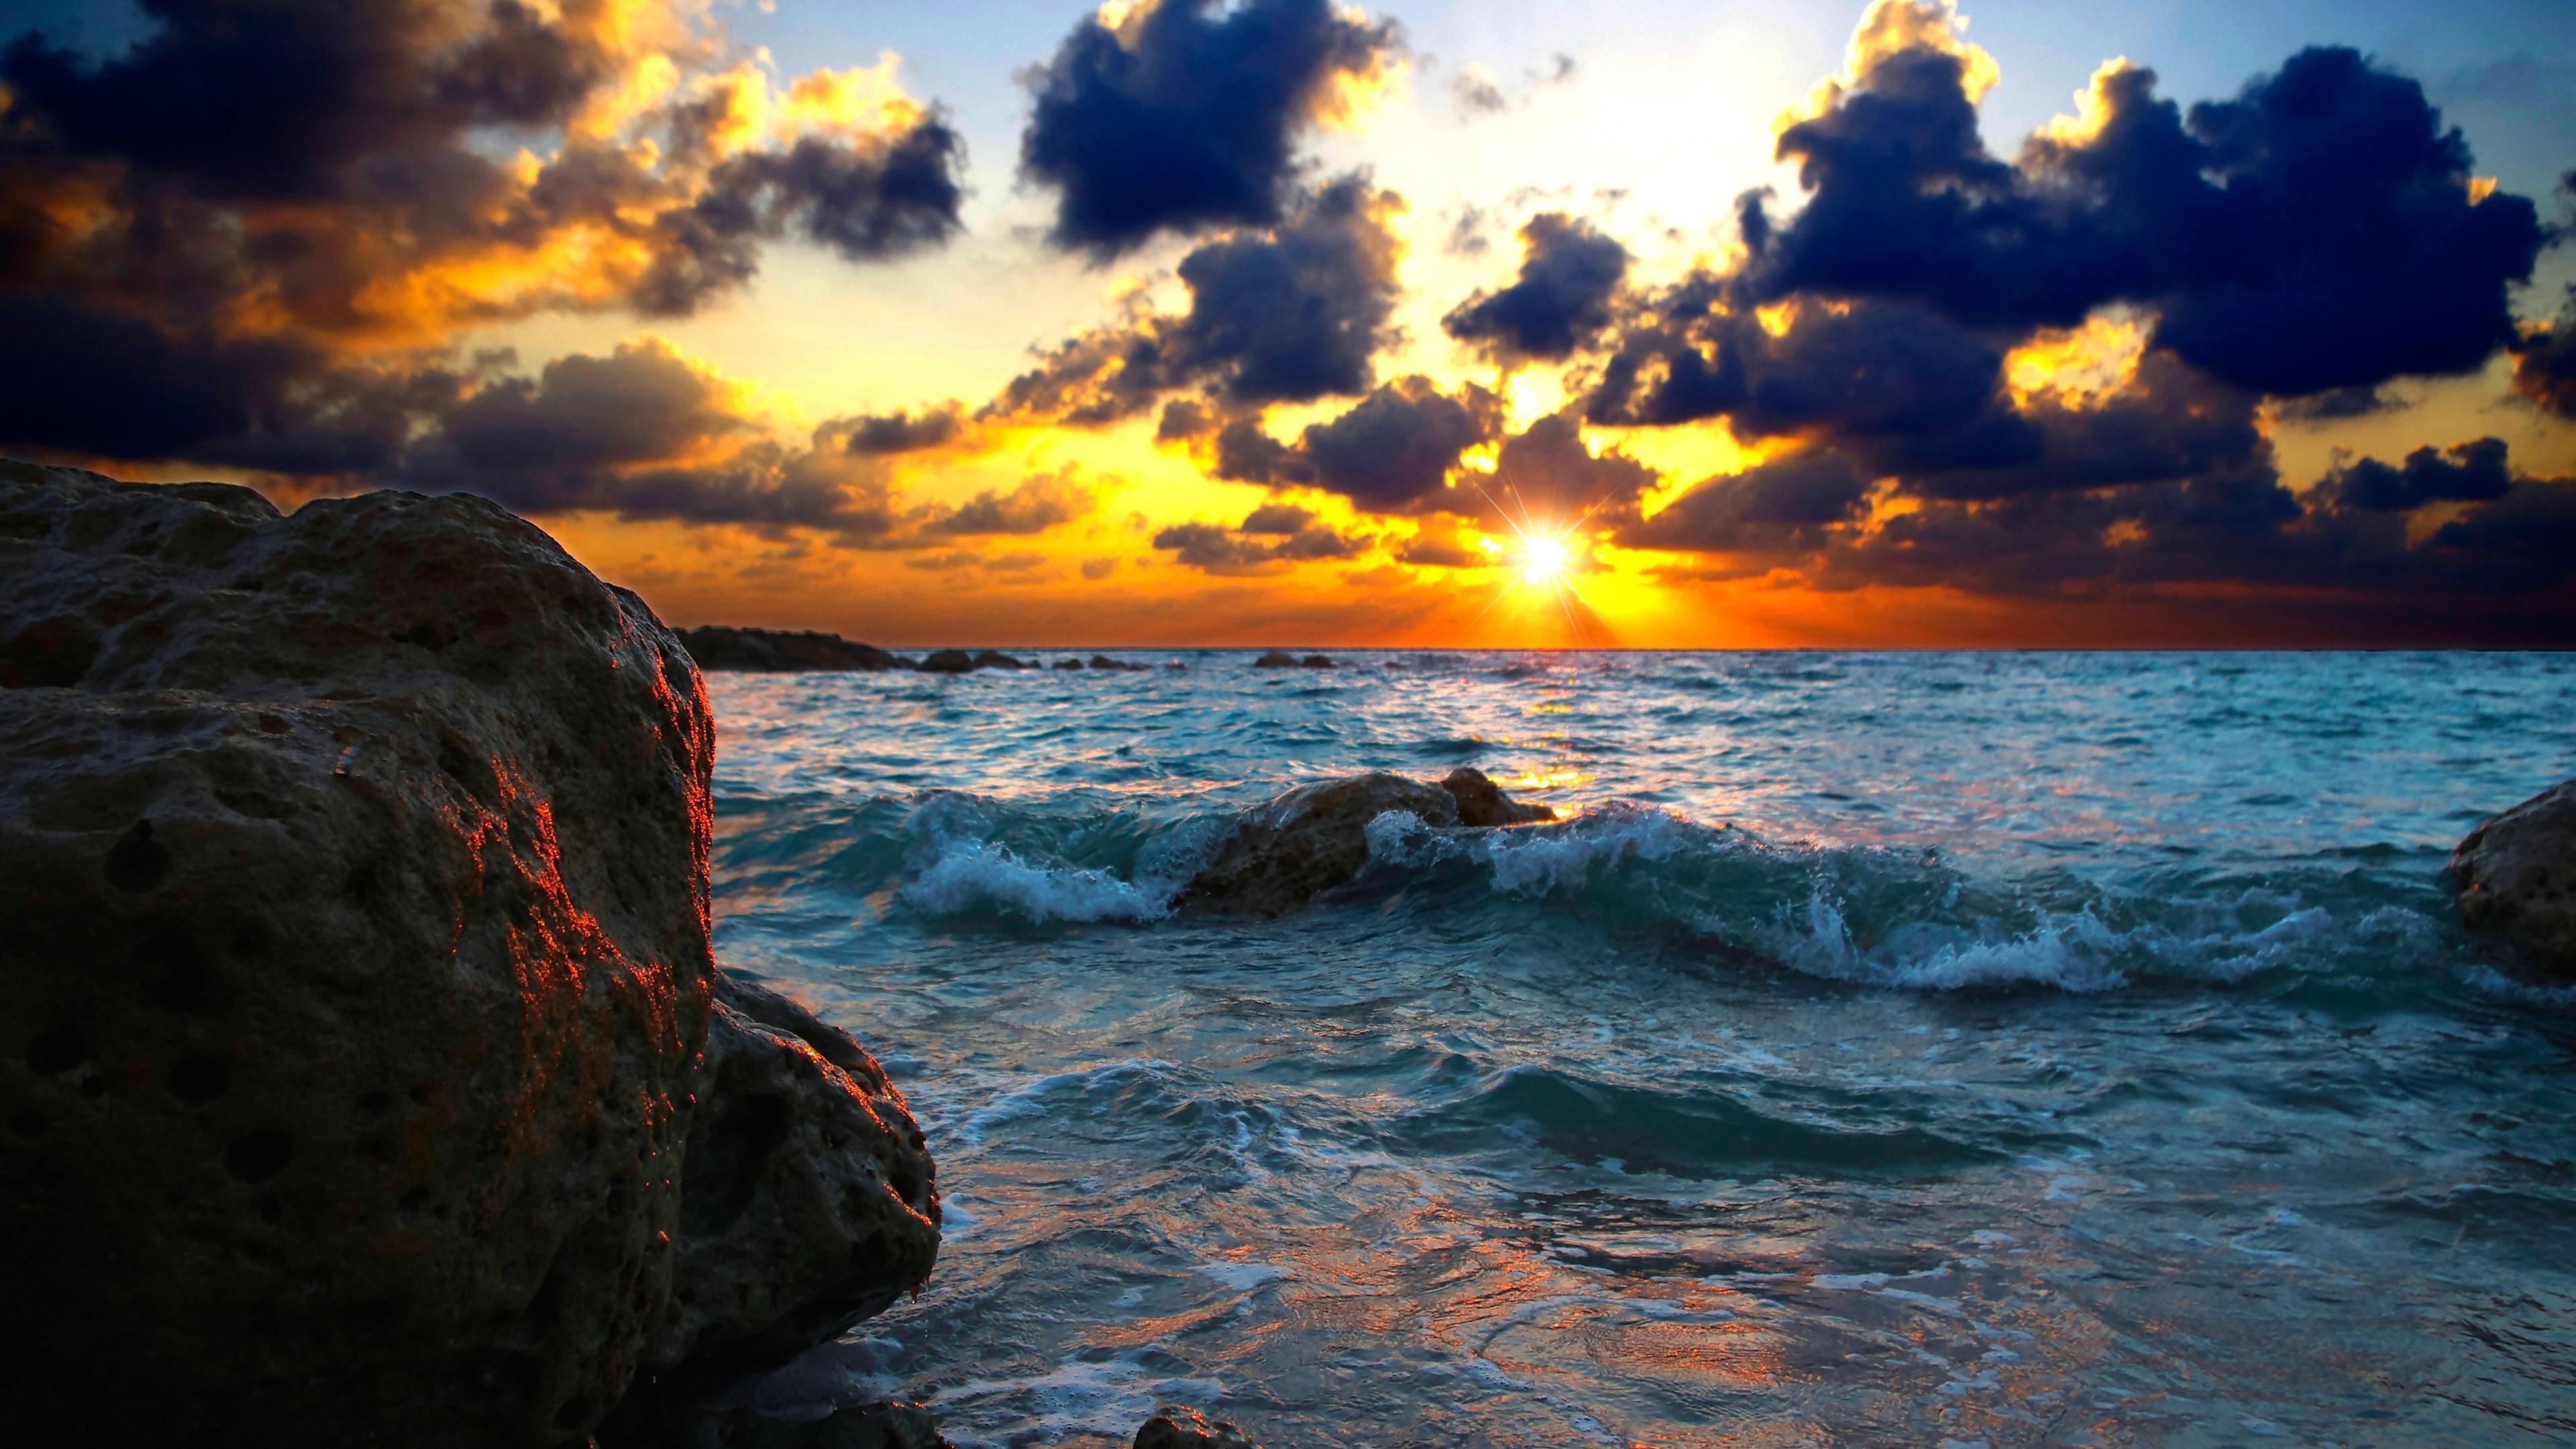 … Background 4K Ultra HD. Wallpaper sea, surf, sunset, stones